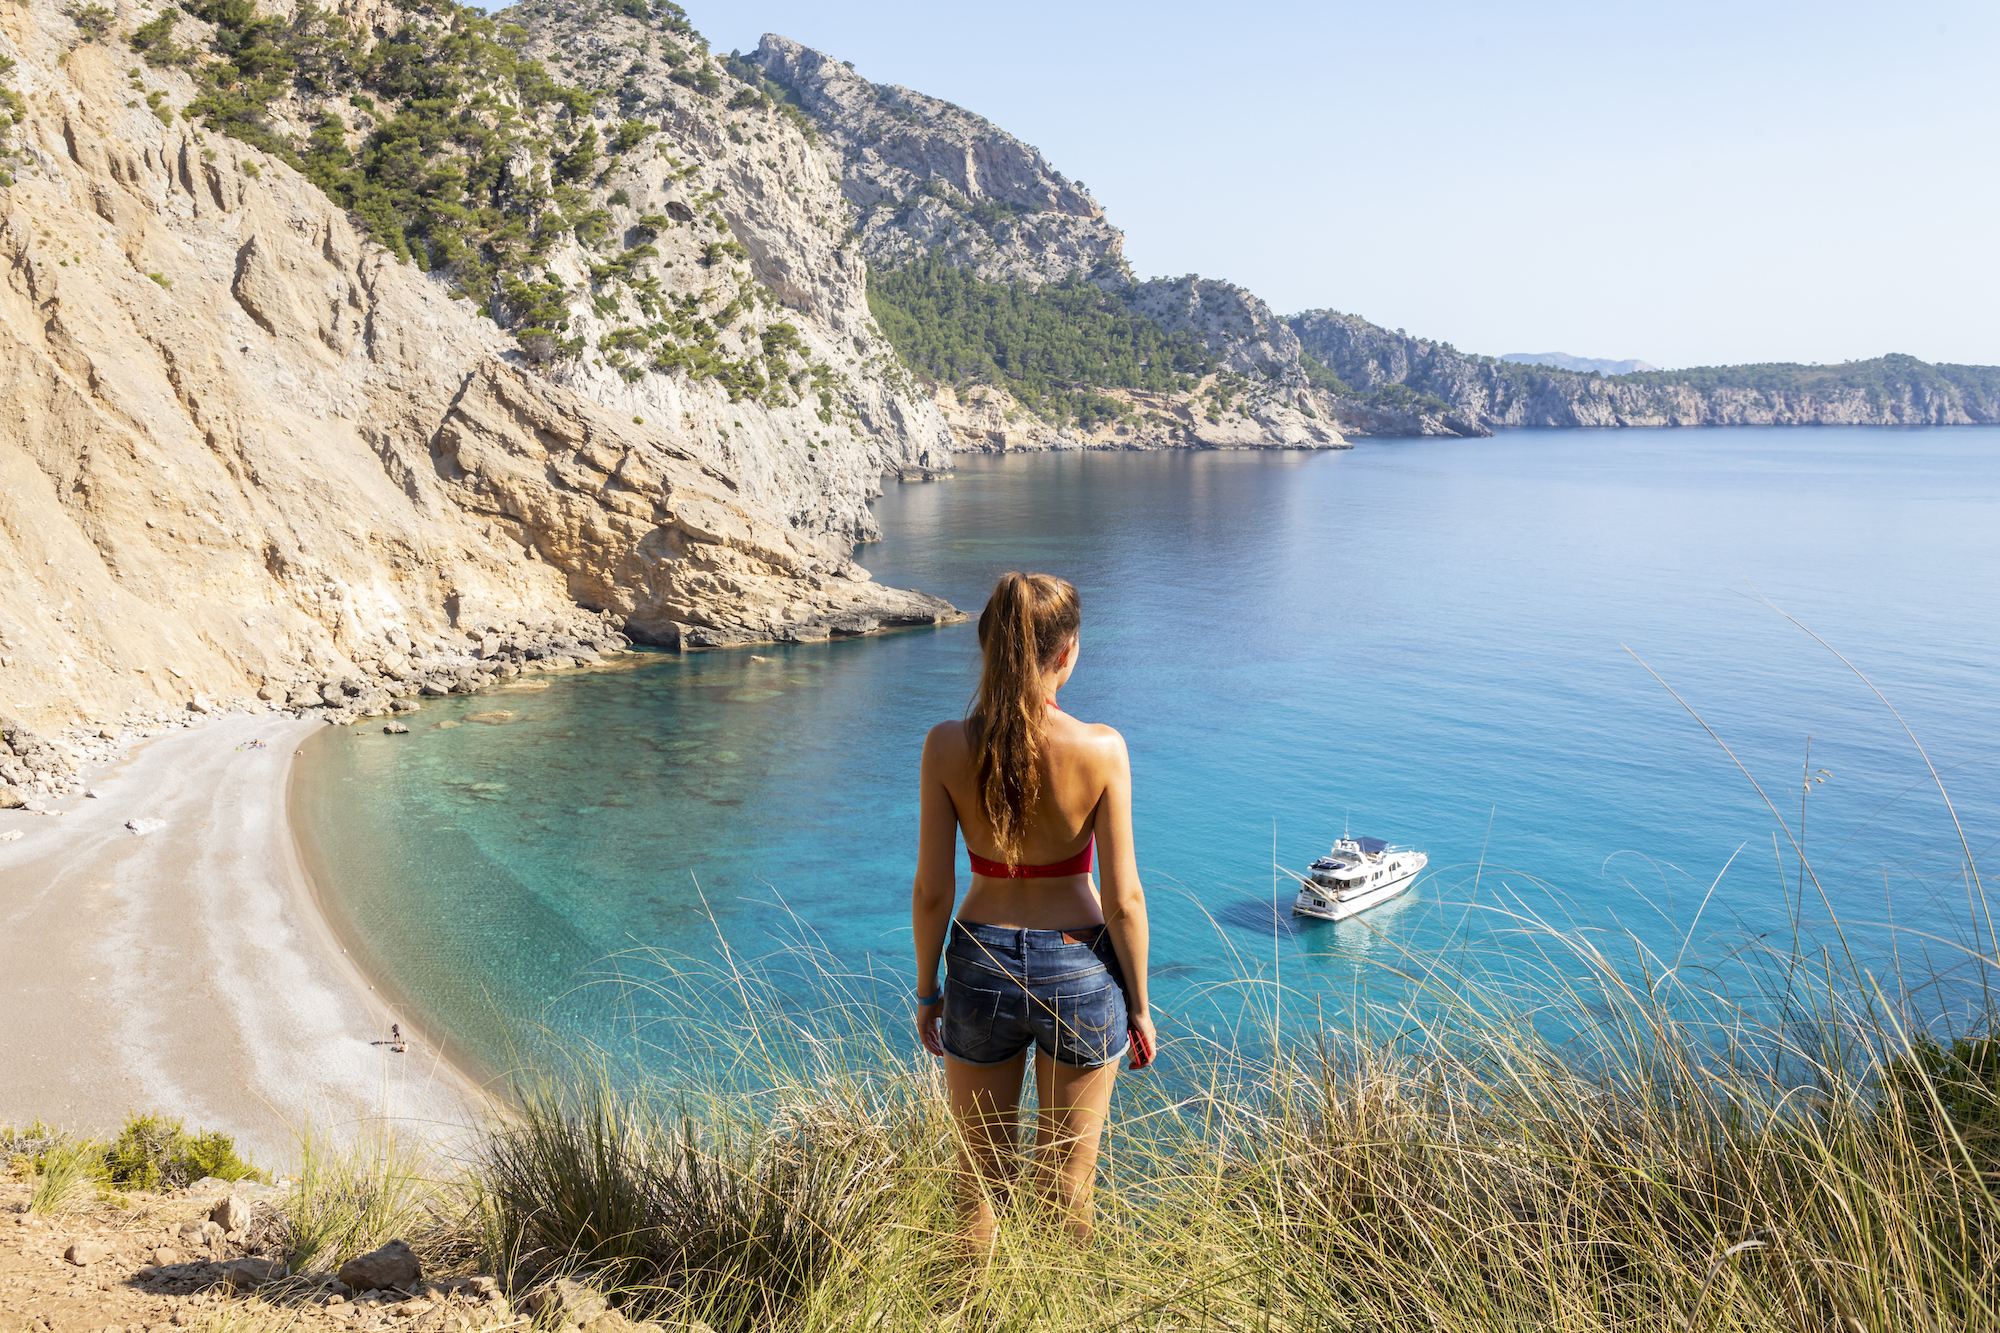 playa coll baix 2018 mallorca tr4vel.de wandern